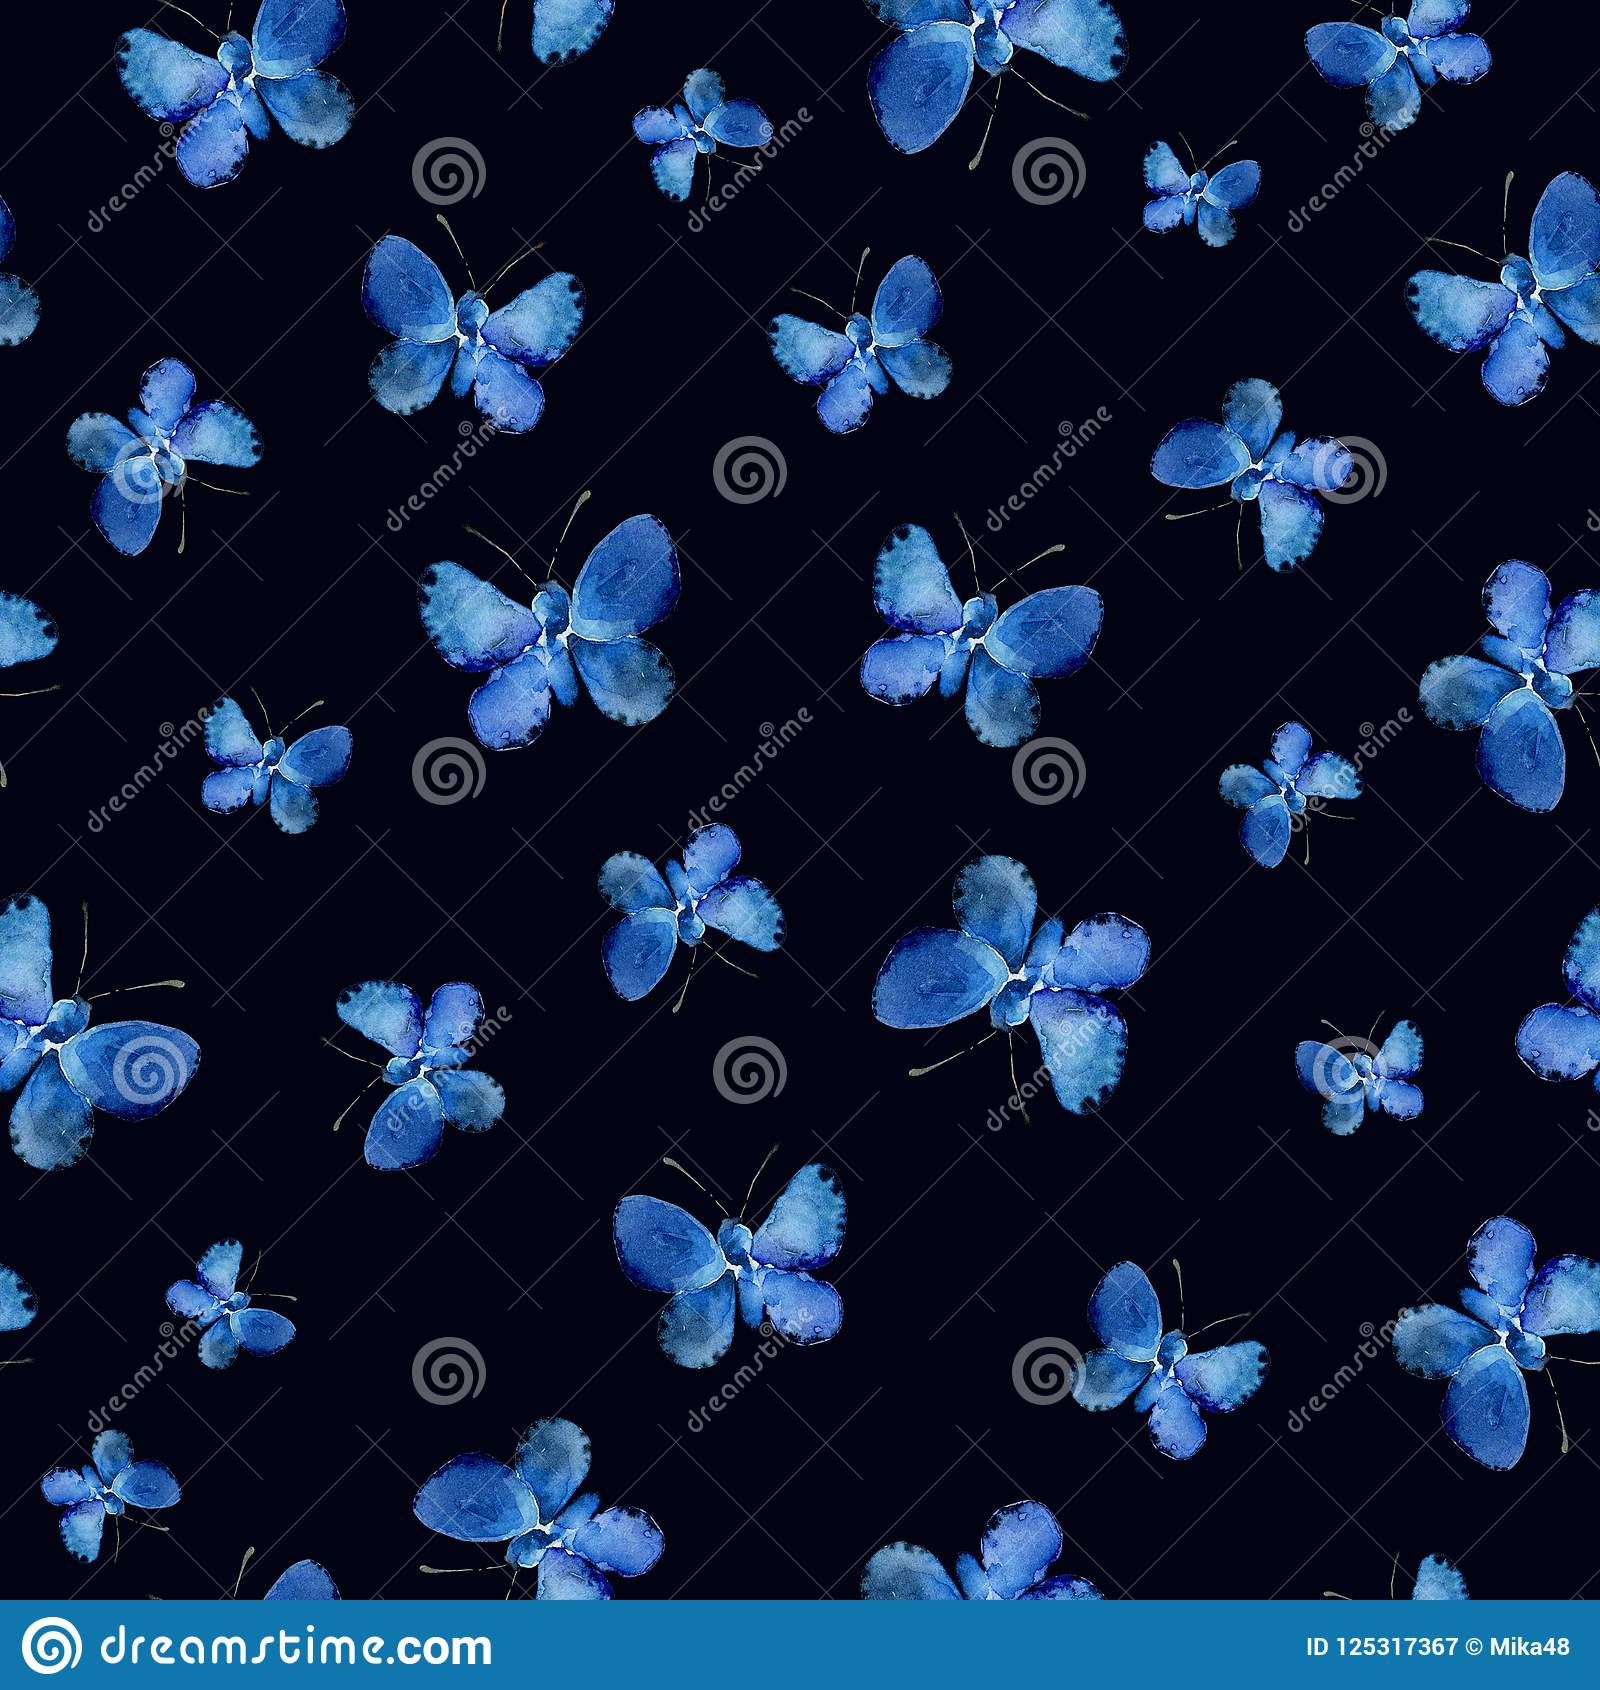 Seamless pattern with blue butterflies